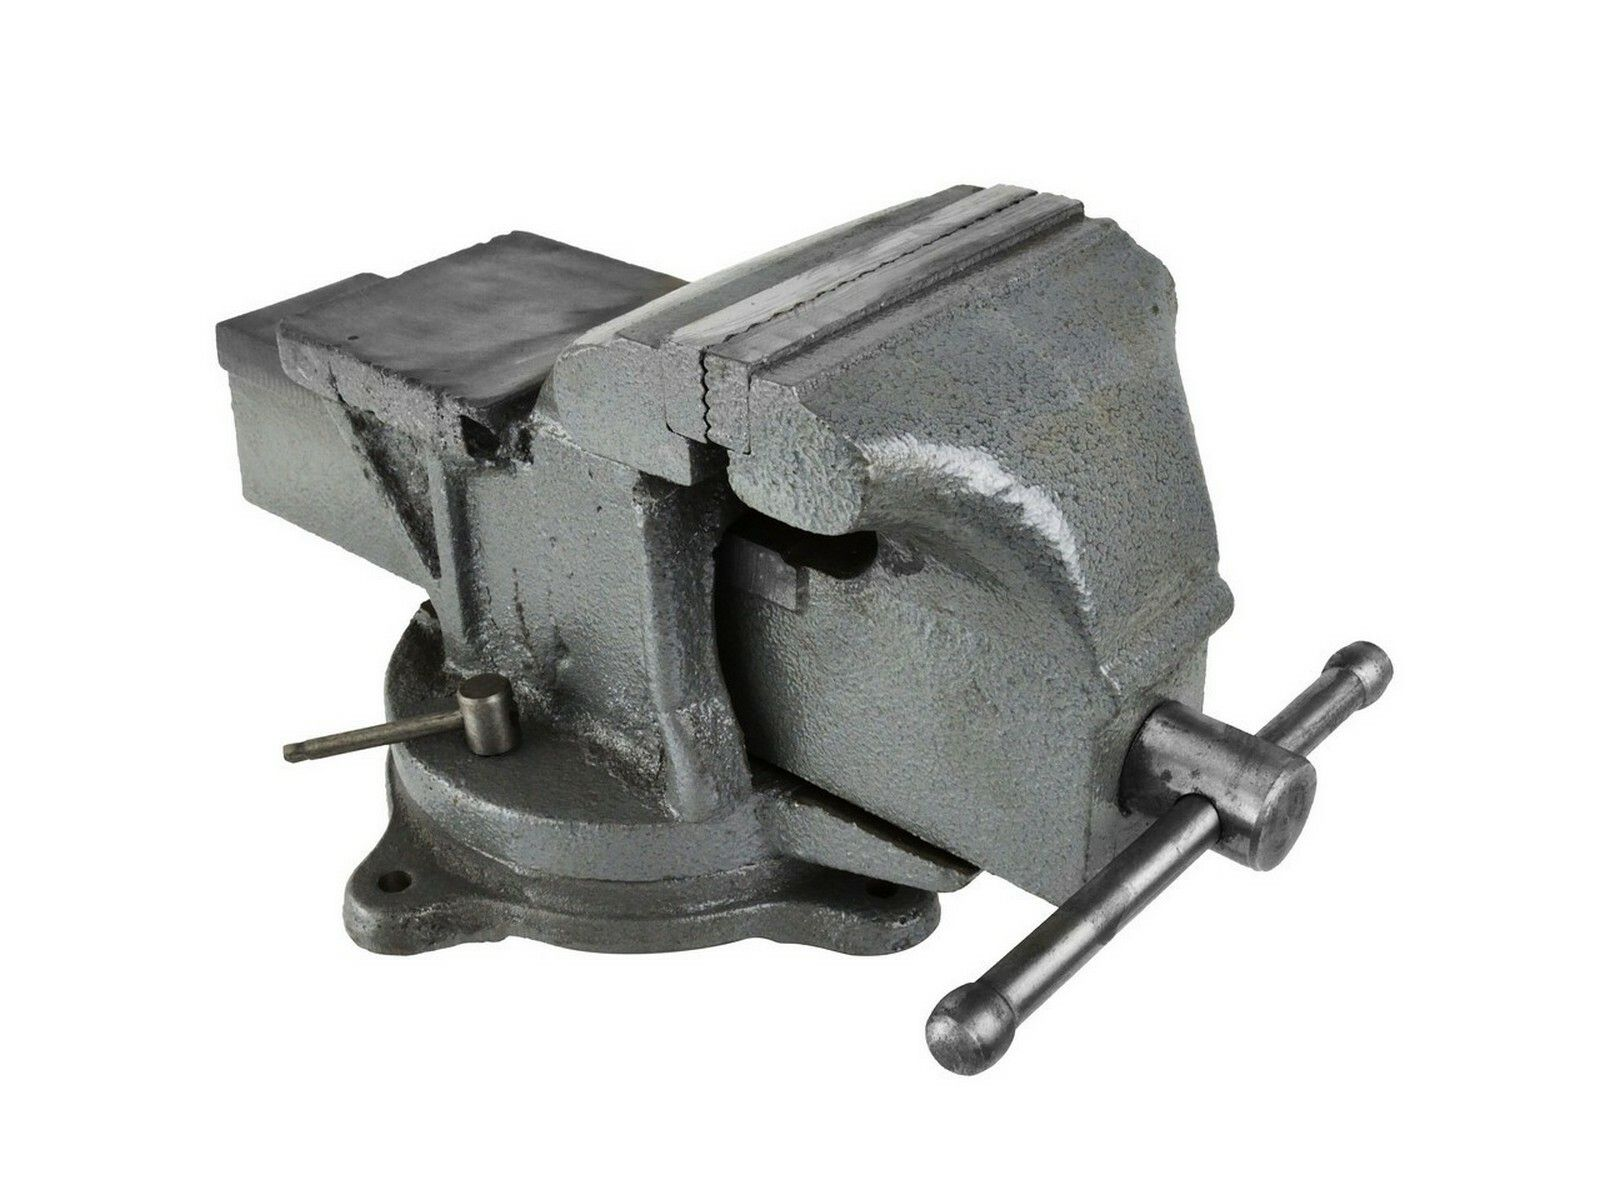 "Svěrák otočný s kovadlinou, 125mm/5"", 14kg GEKO"